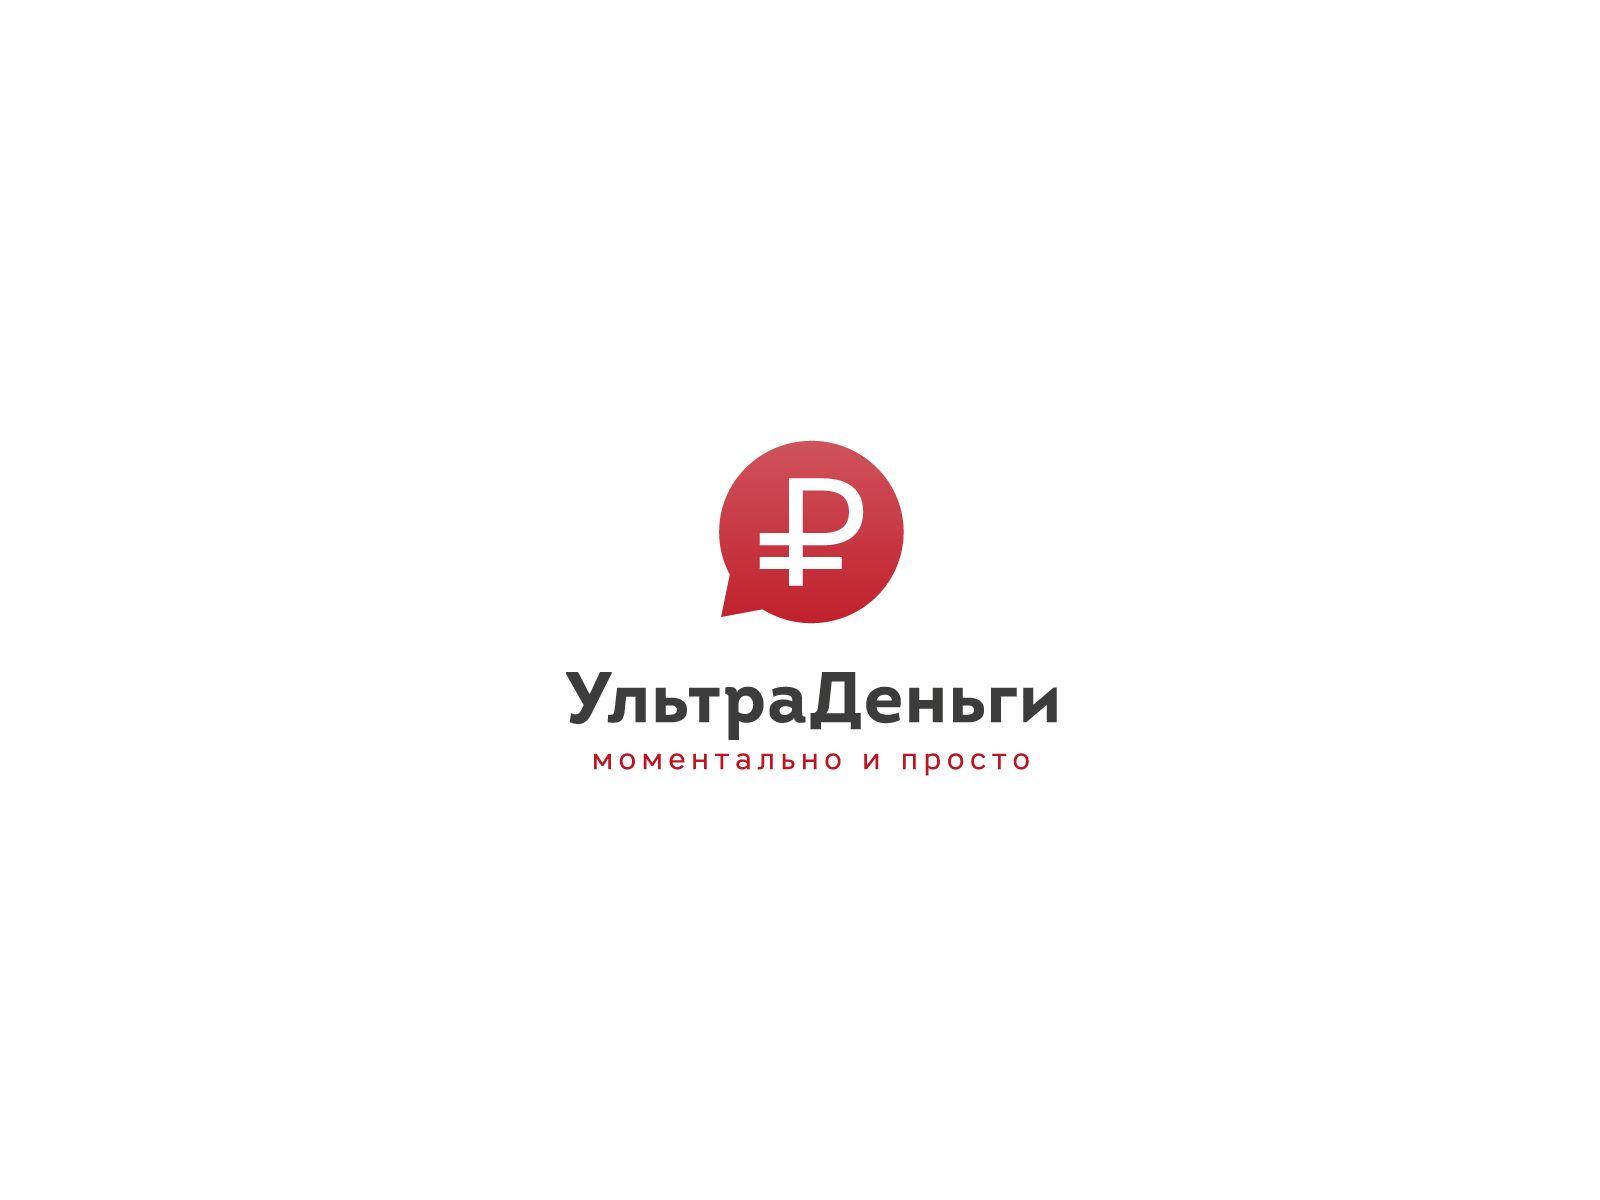 Логотип для сайта МФО ultra-dengi.ru - дизайнер U4po4mak